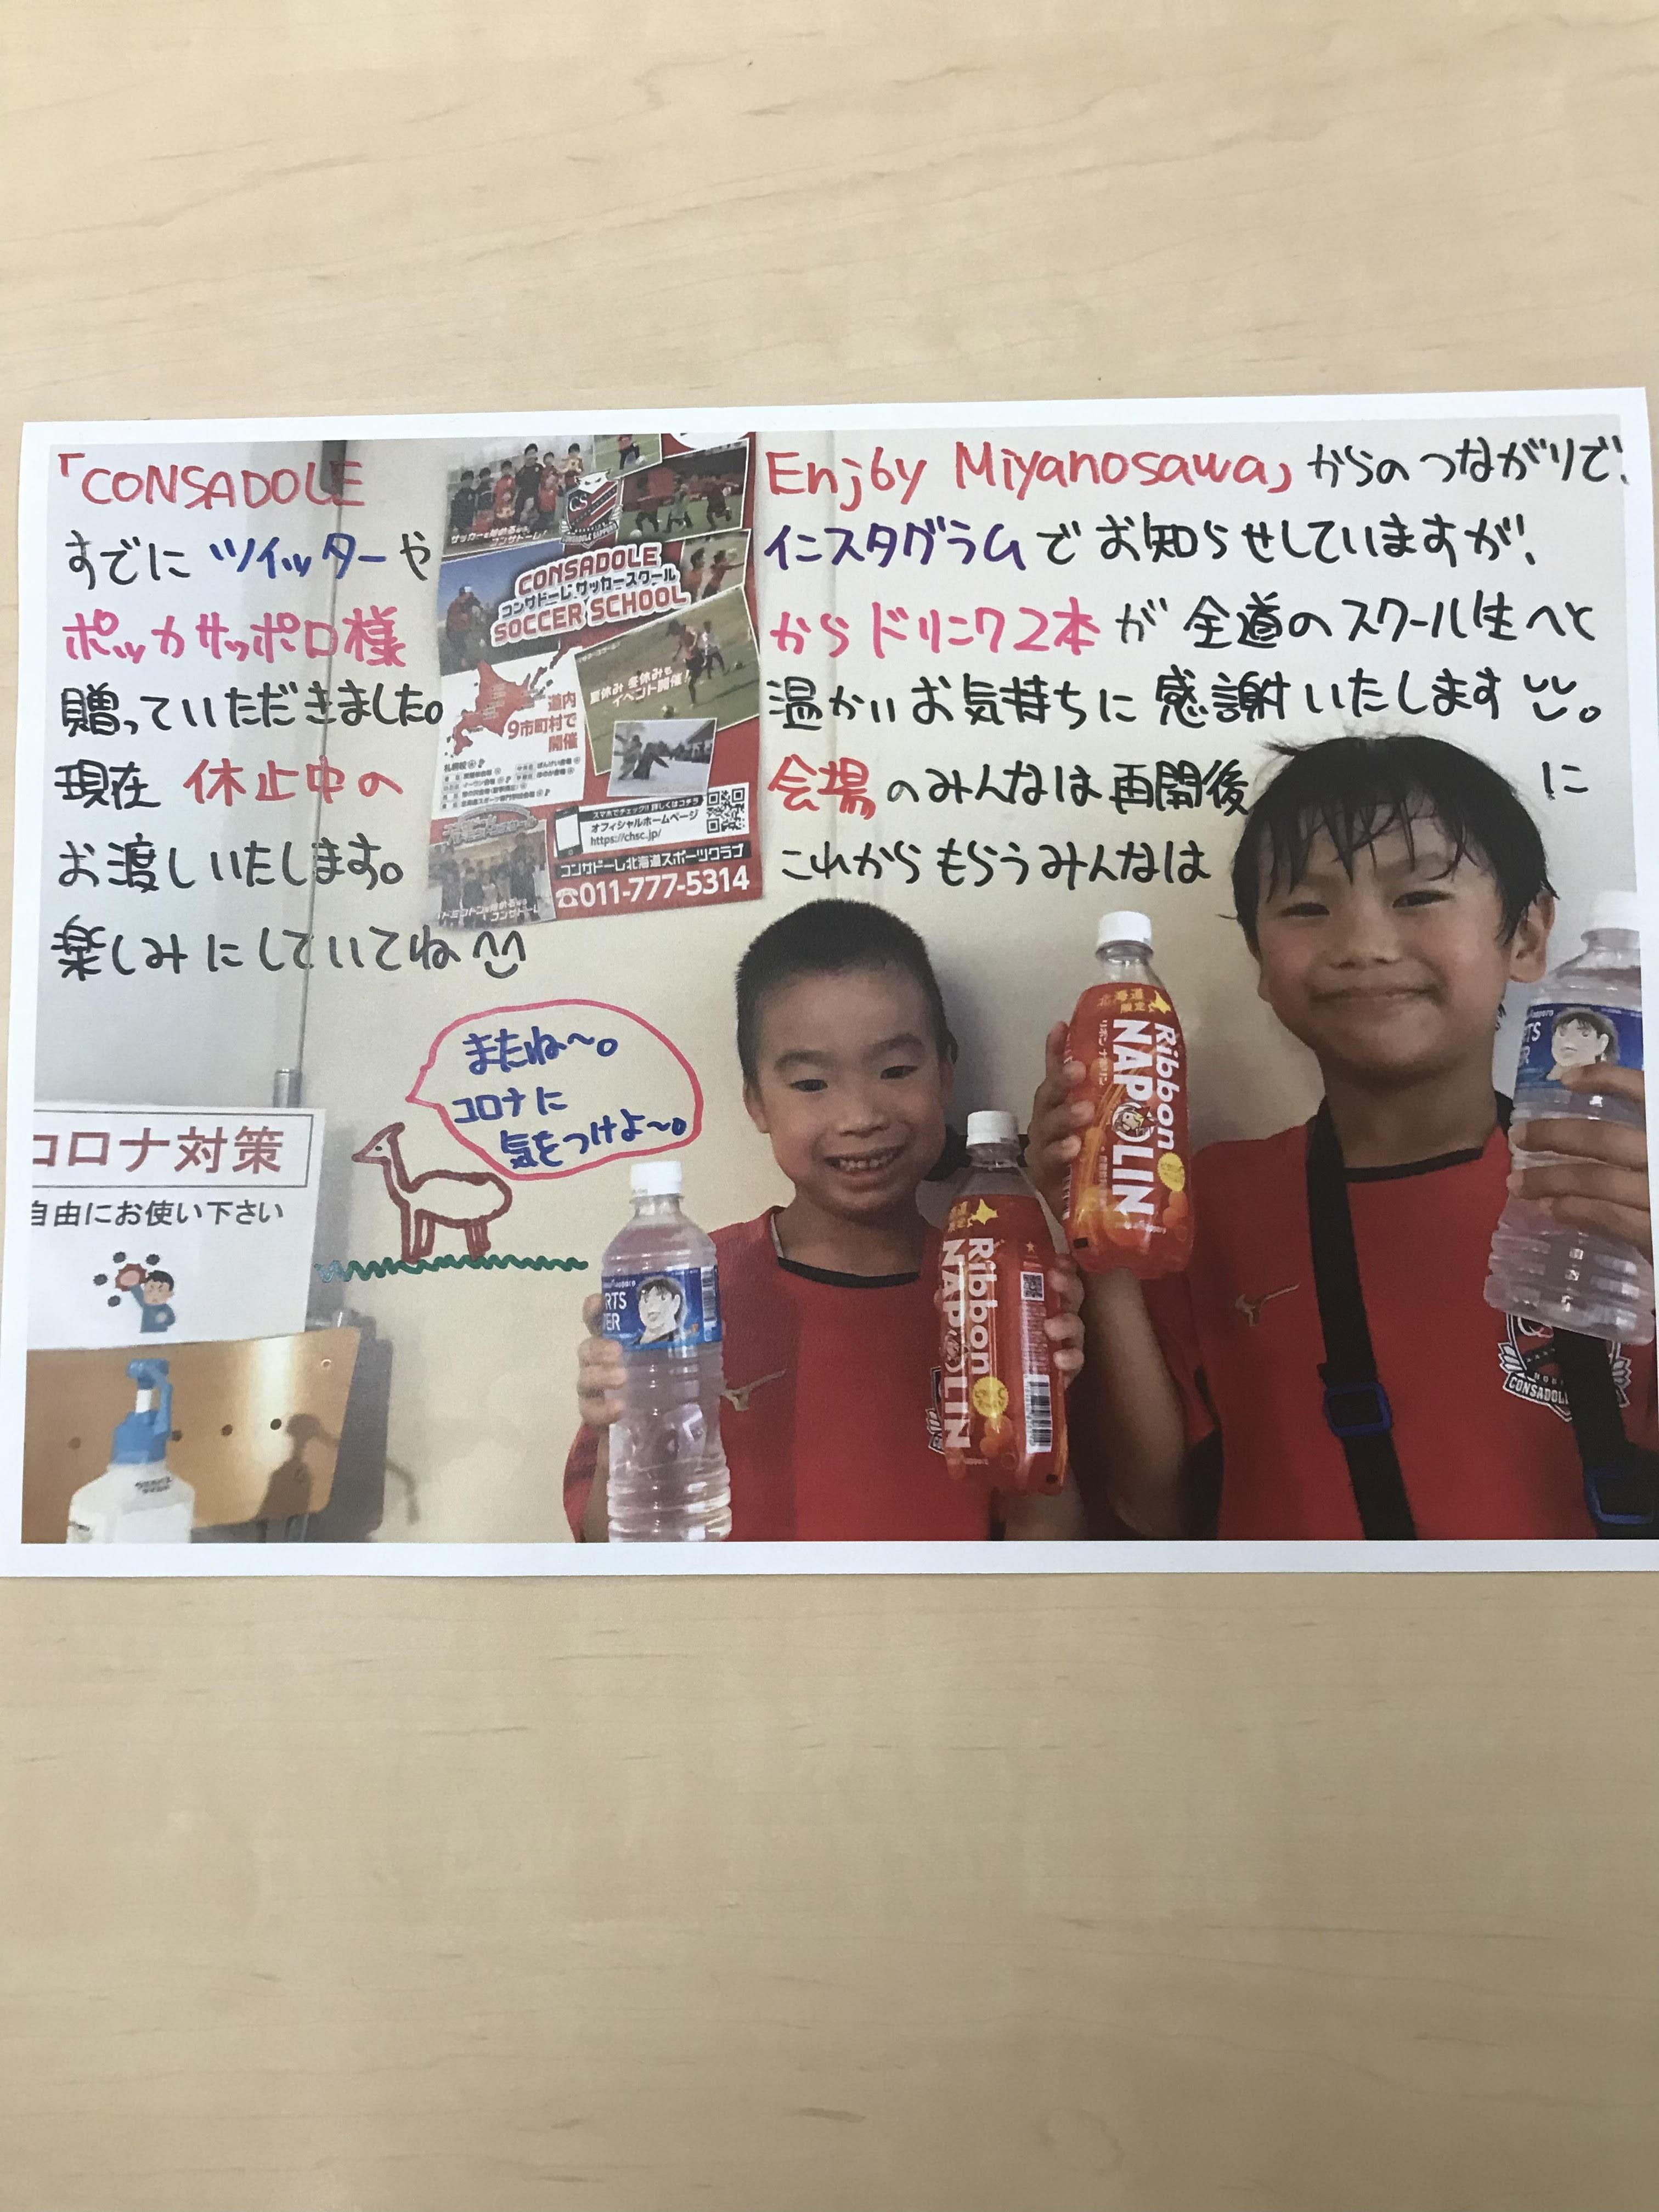 https://chsc.jp/news/up_images/%2332%283%29.jpg